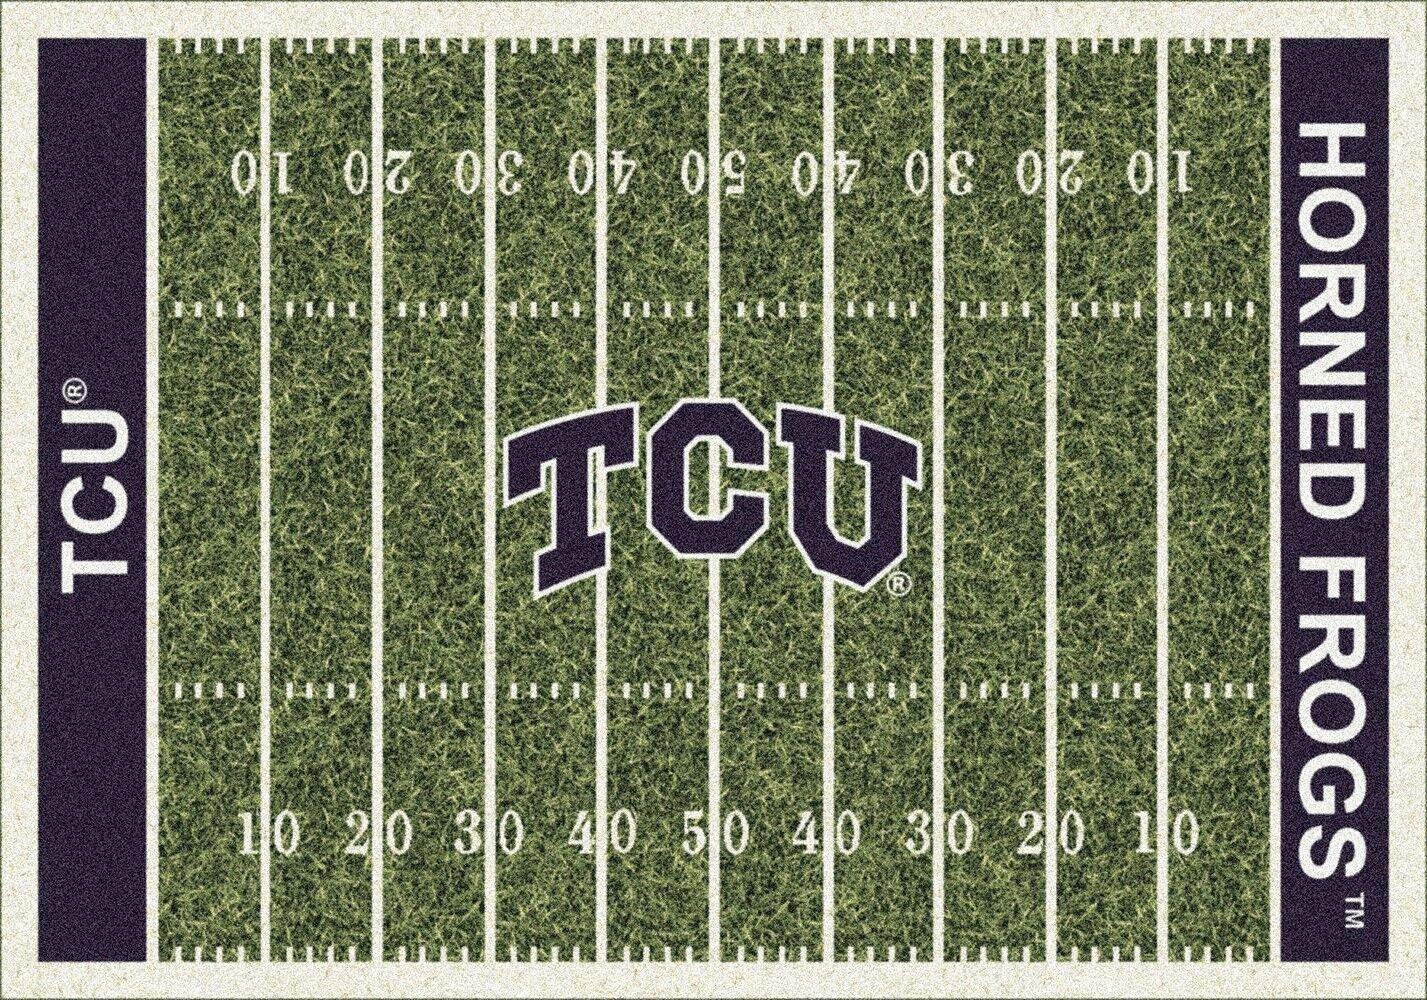 Texas Christian Horned Frogs Milliken NCAA Home Field Area Rug (5'4'' x 7'8'')